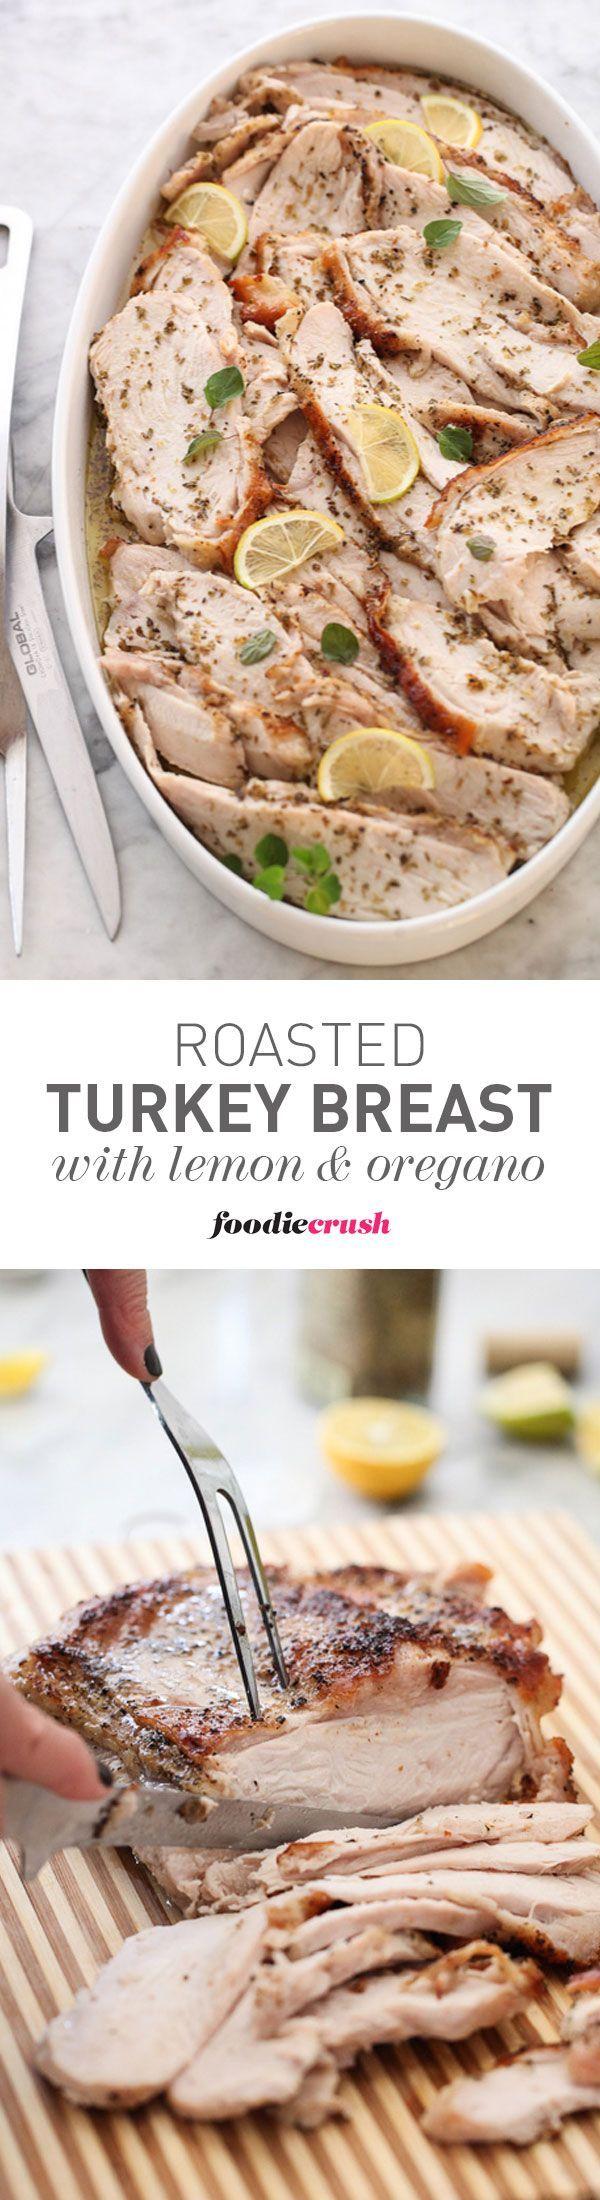 Roasted Turkey Breast with Lemon and Oregano | Recipe | The o'jays ...